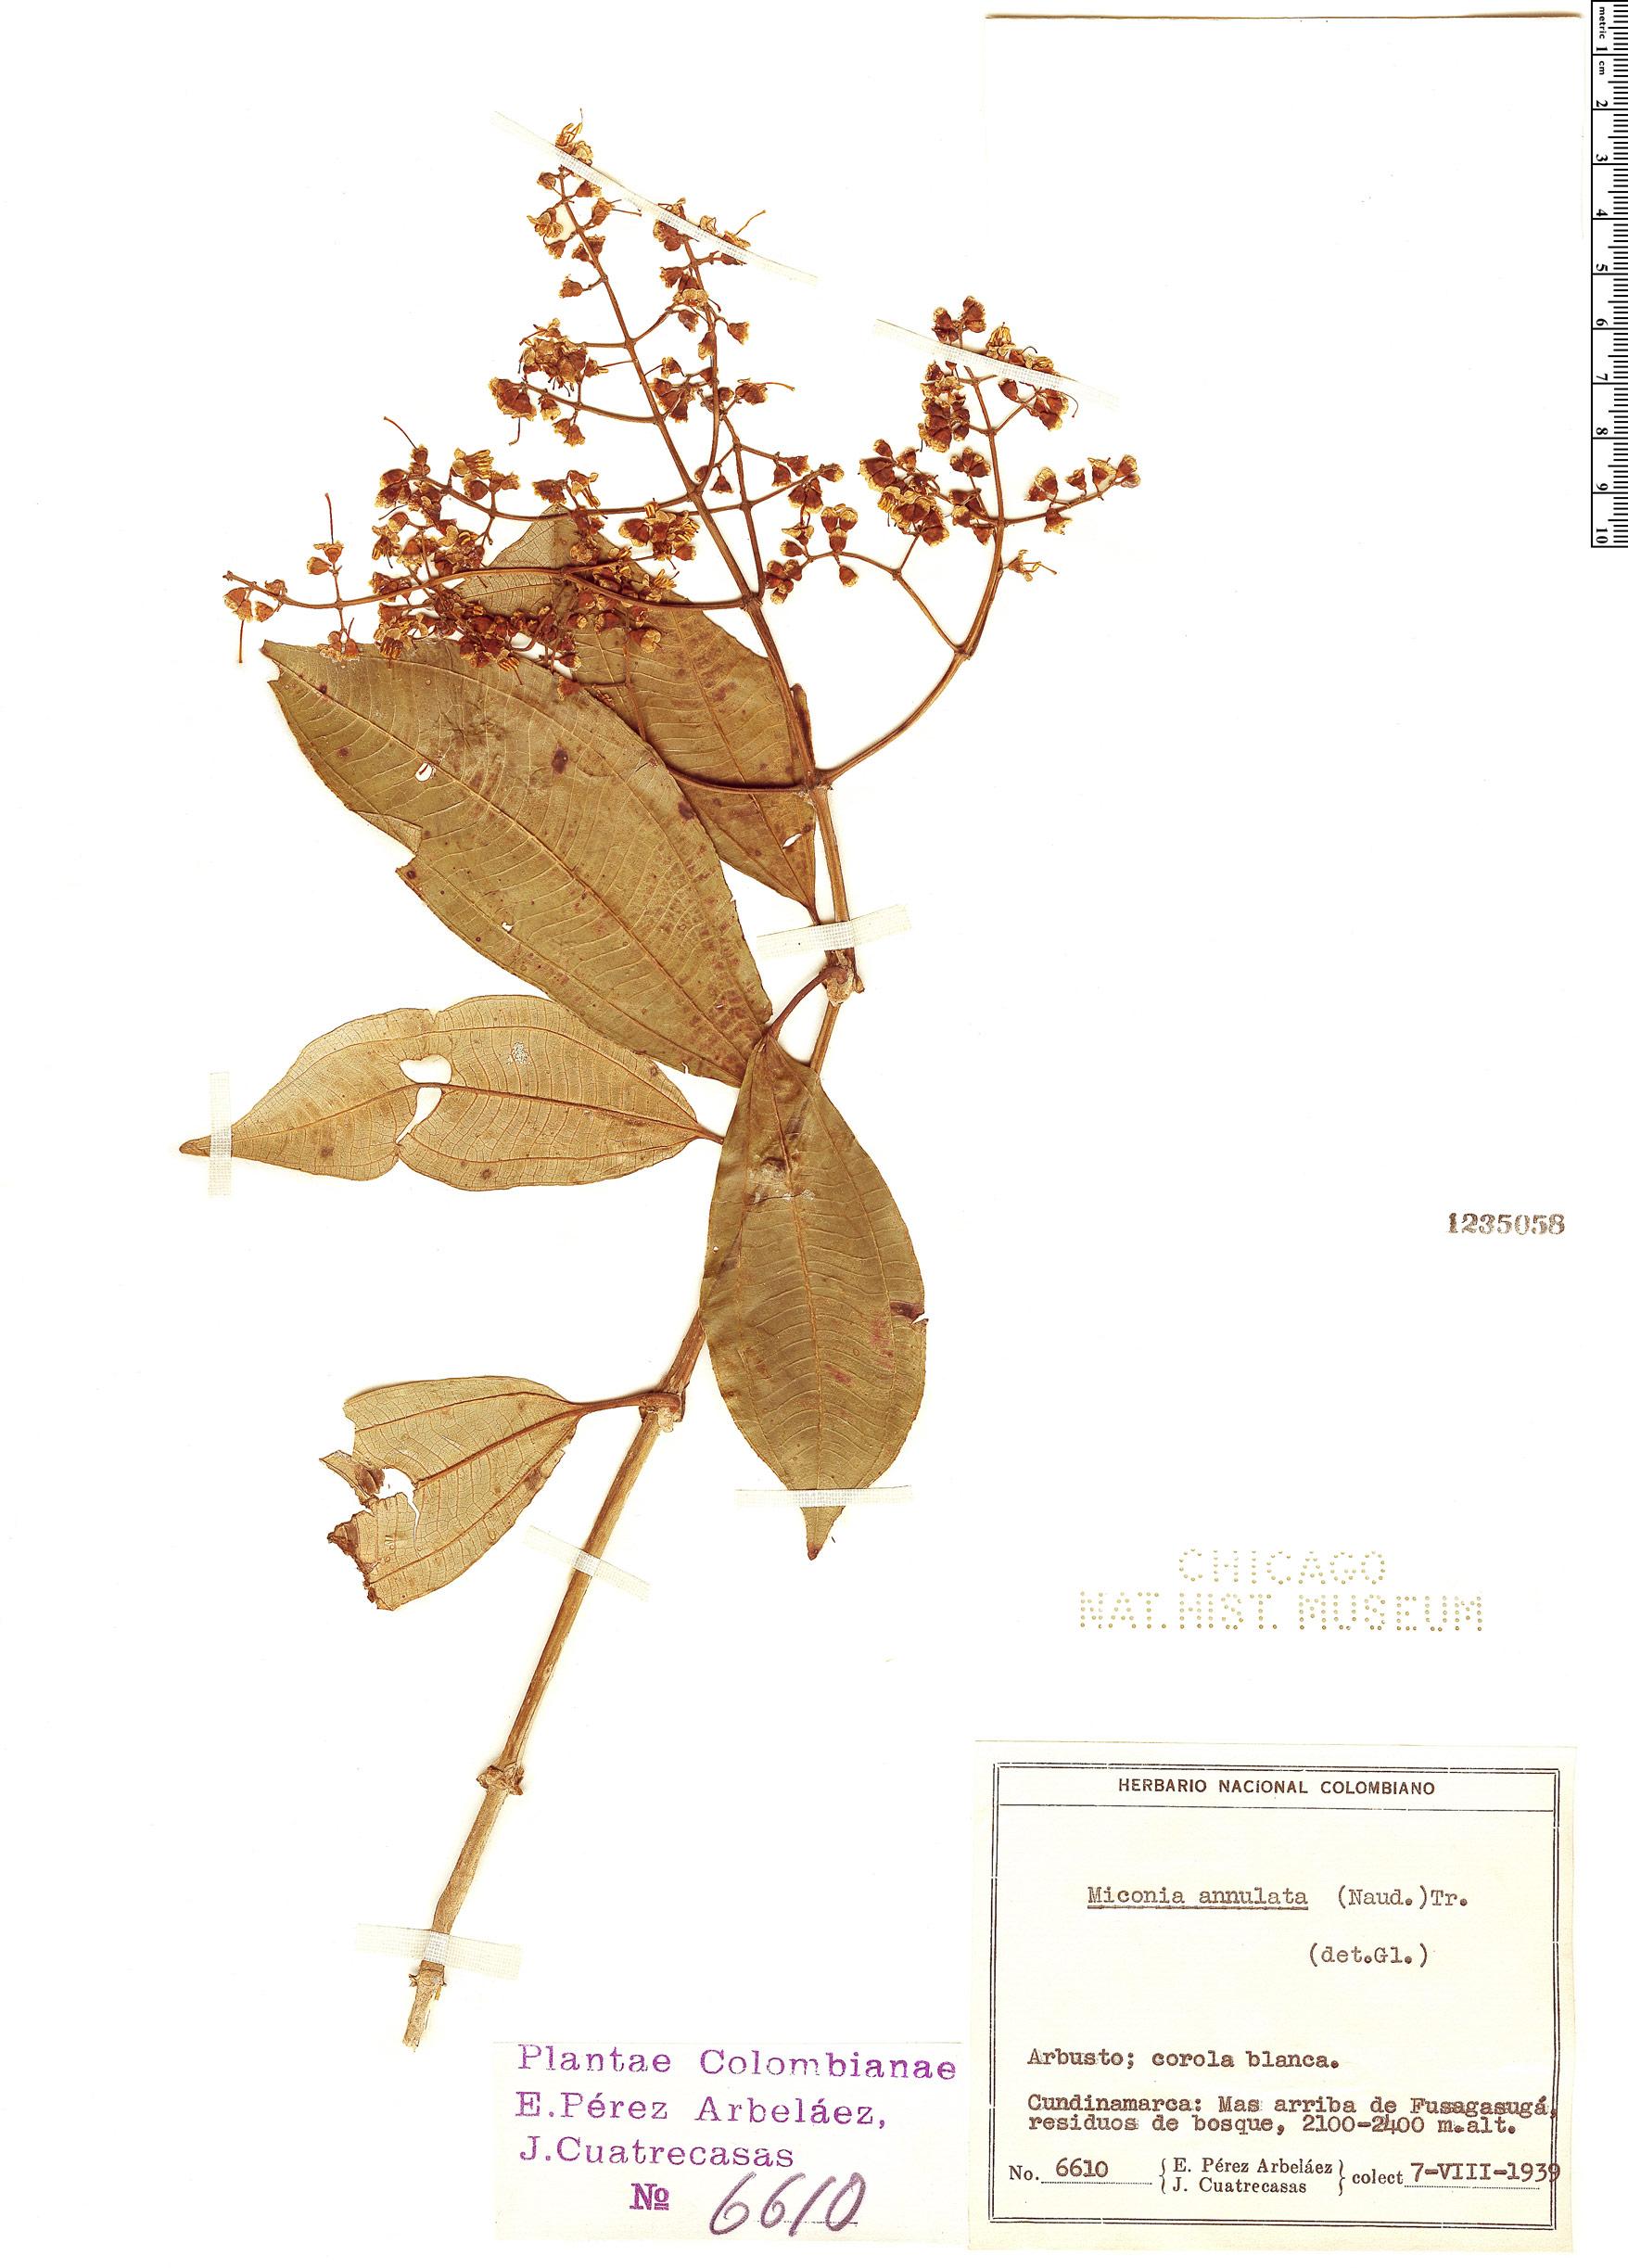 Specimen: Miconia annulata